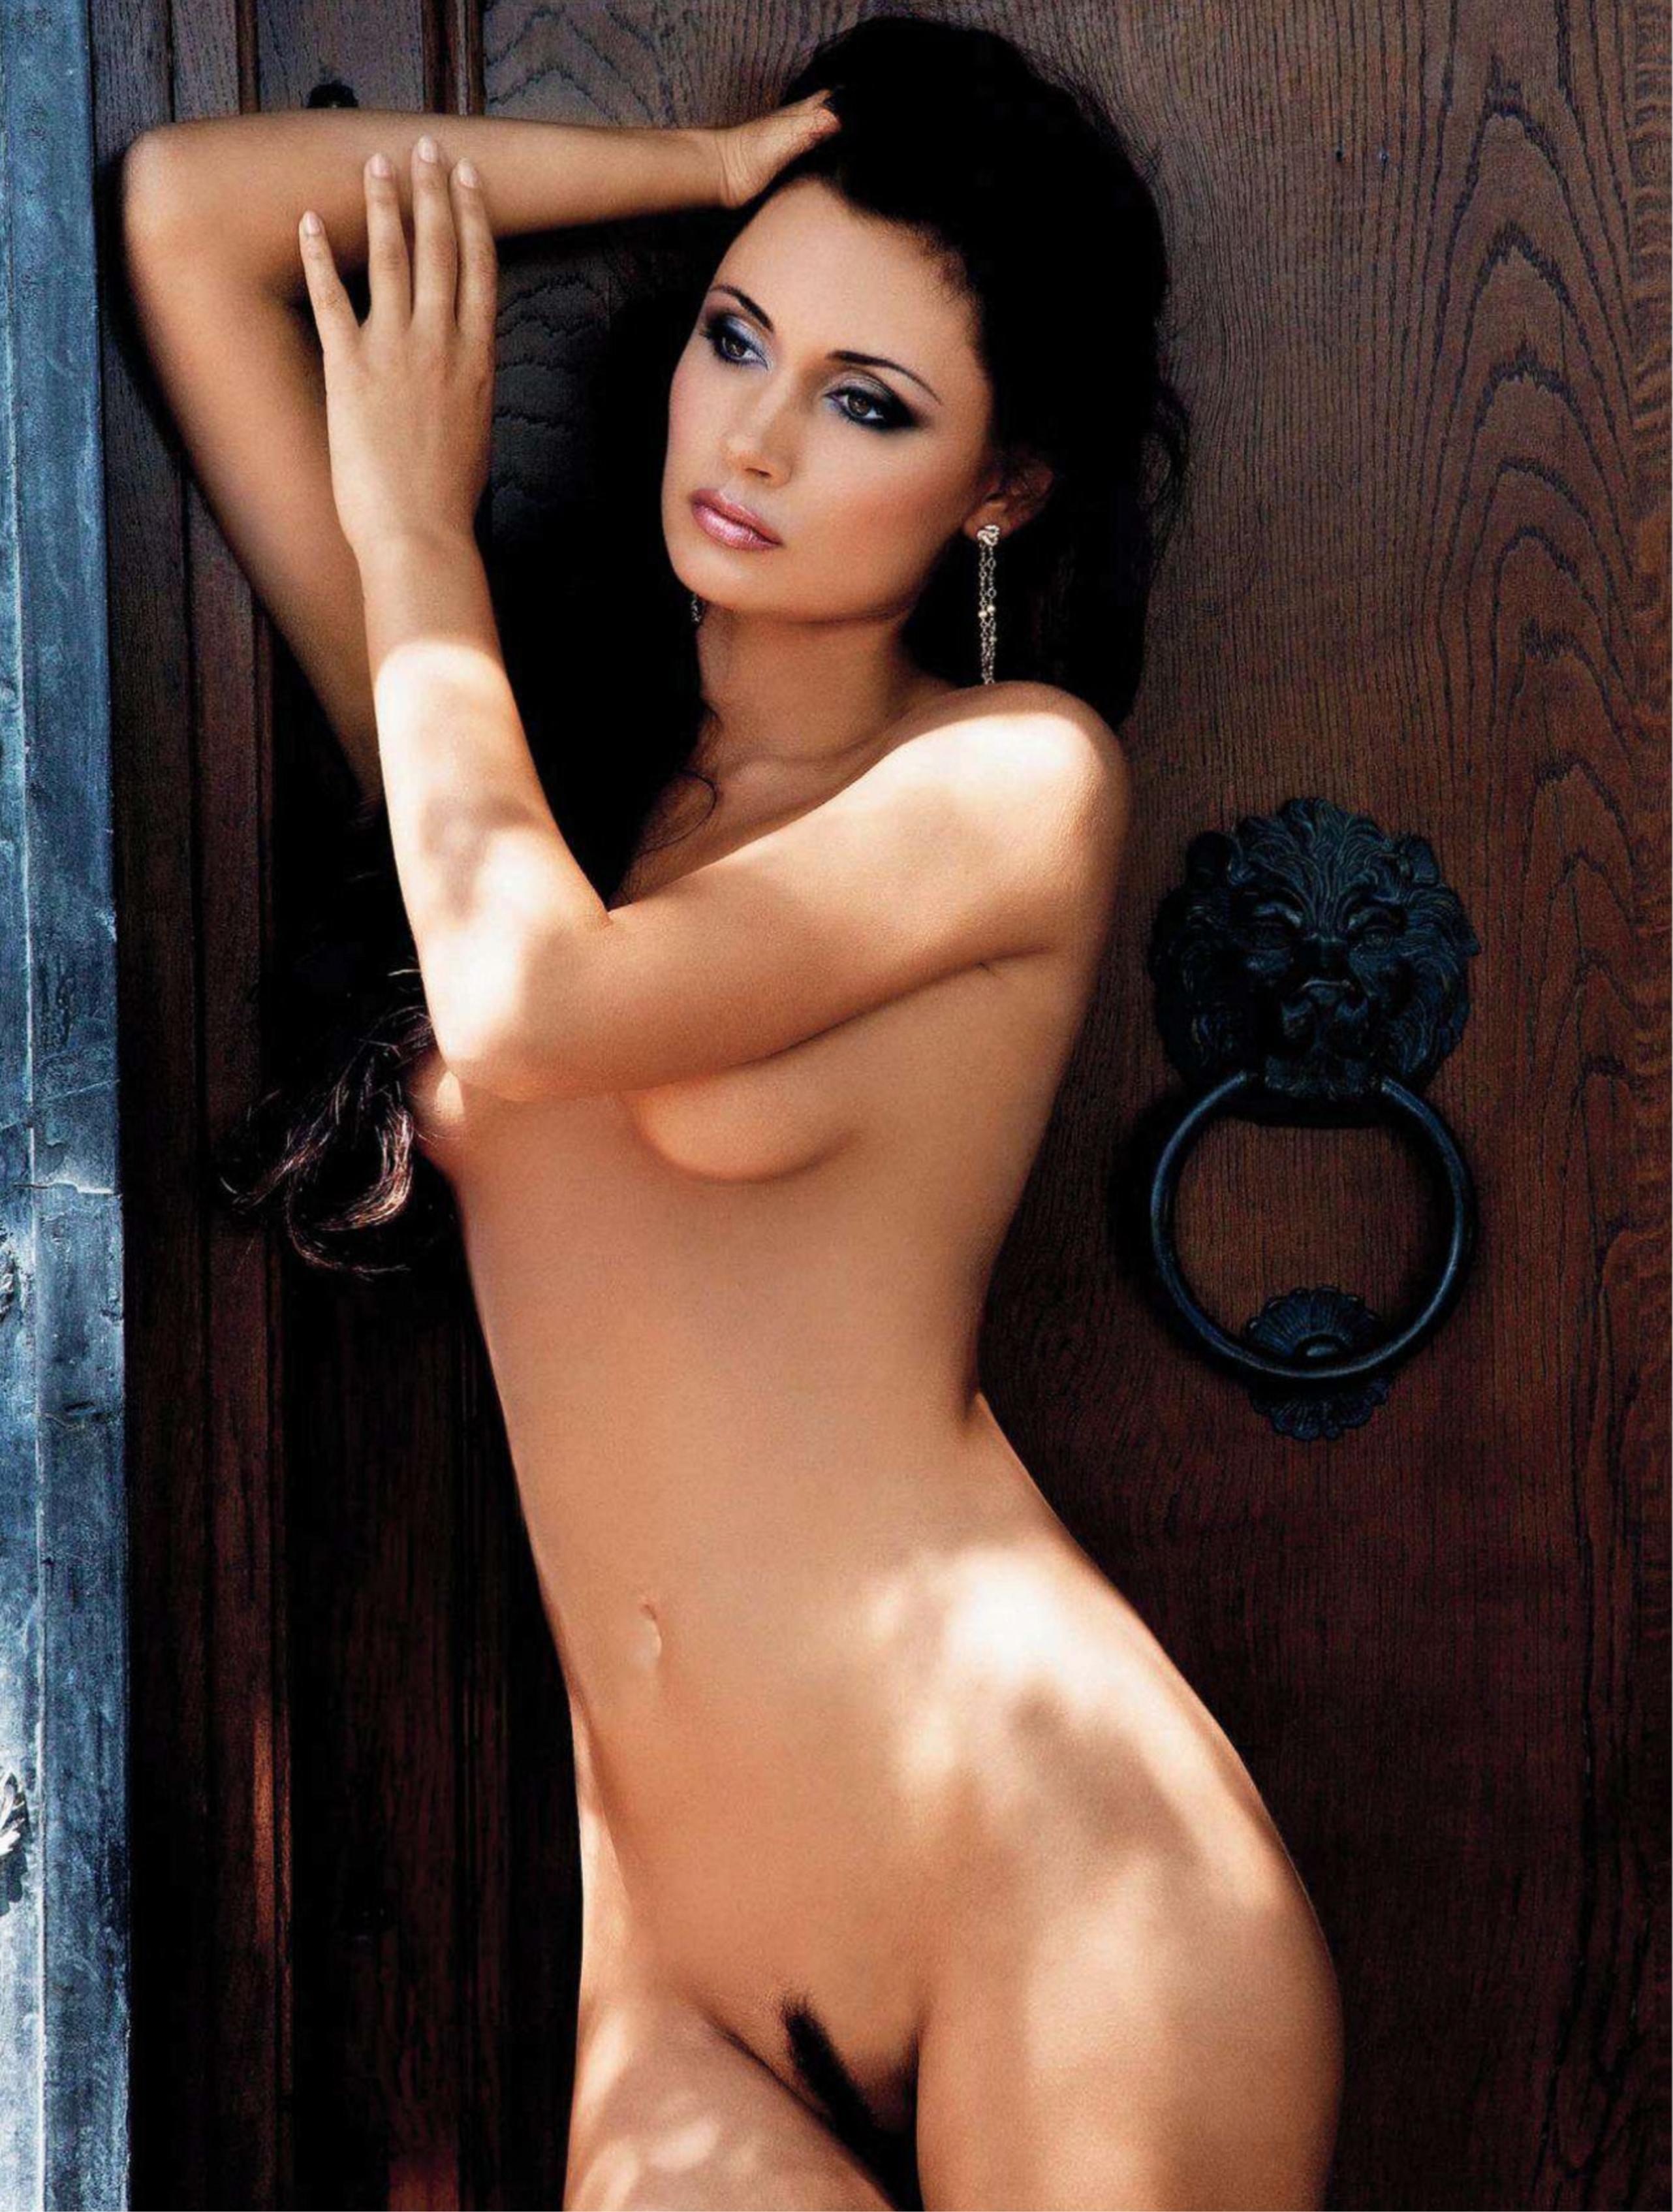 441722874_Playboy_2_2012_Croatia_Scanof.net_038_123_117lo.jpg